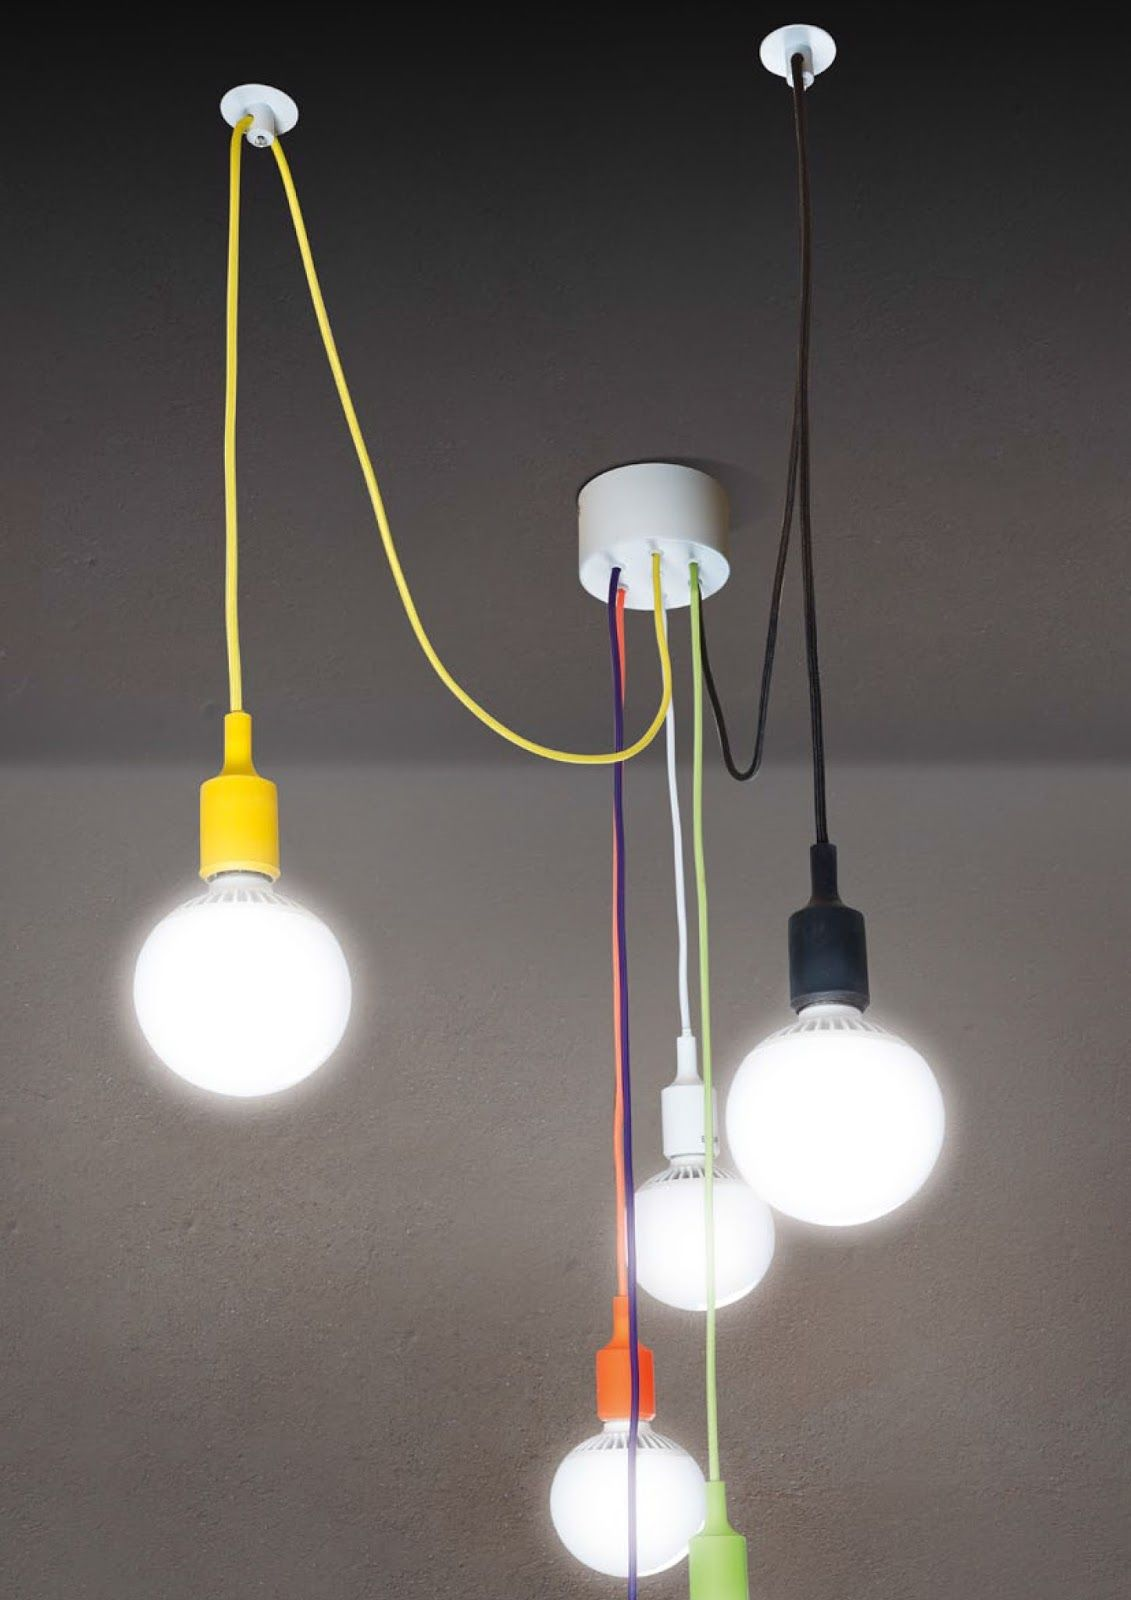 lampadario a sospensione con cavi a vista - Cerca con Google  lampadari con cavi a vista ...